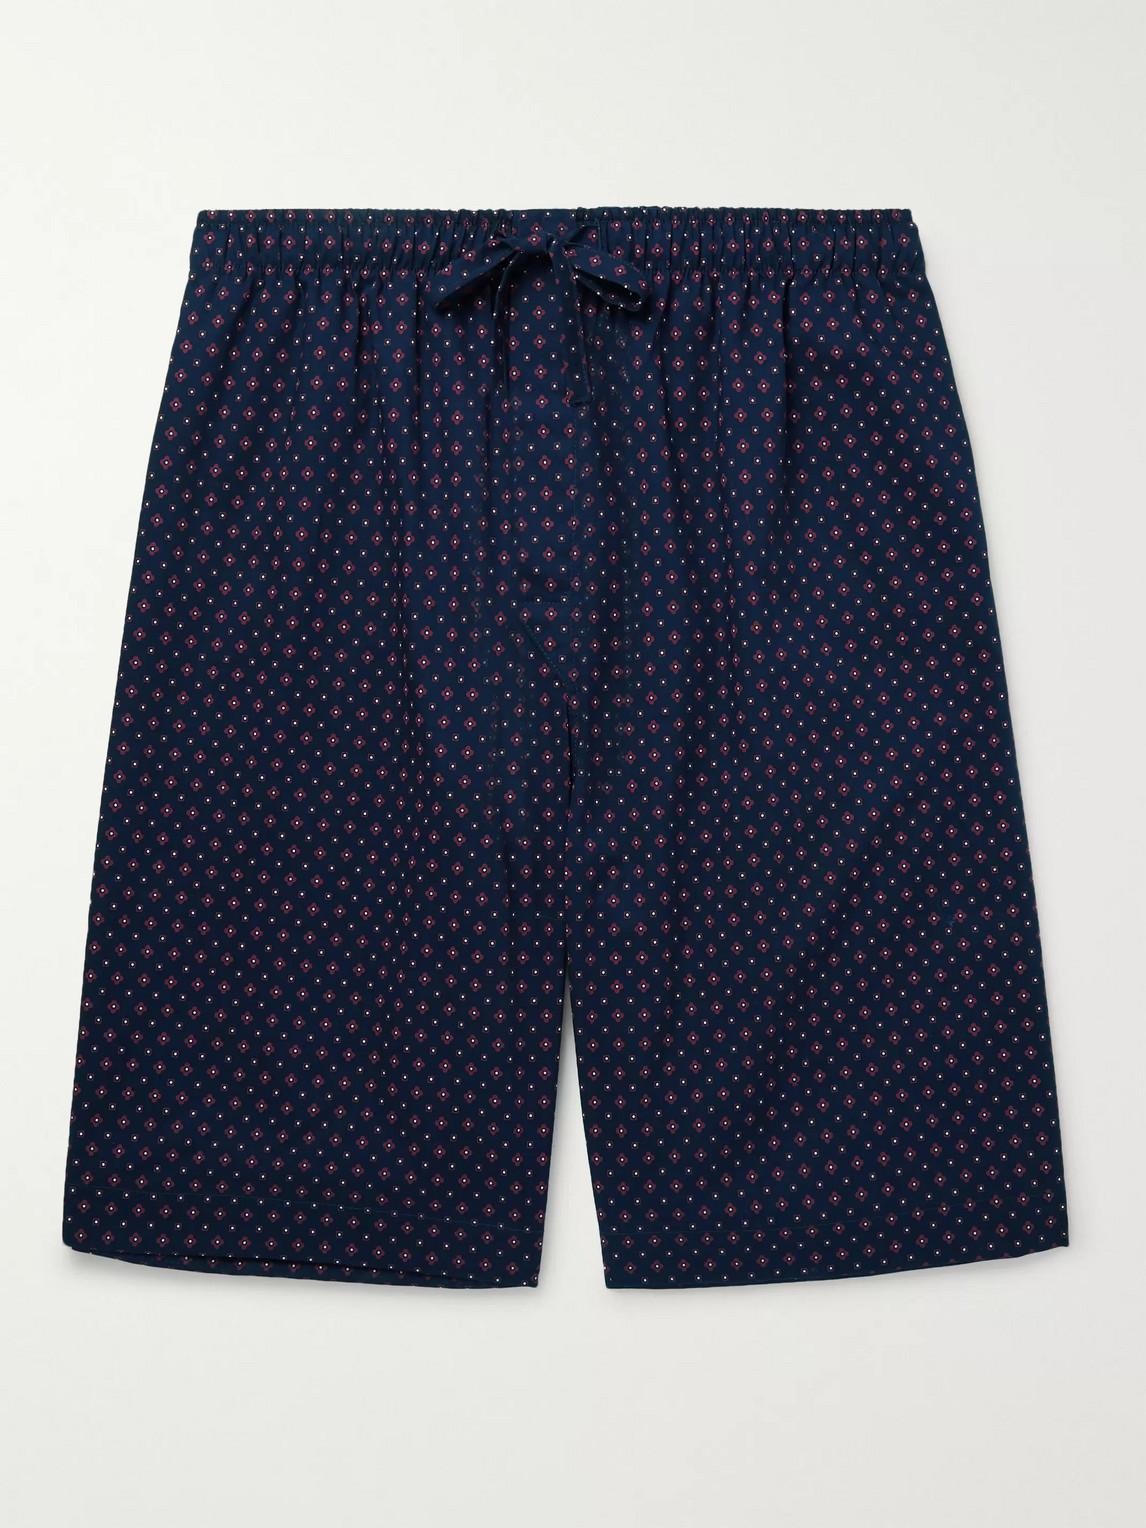 derek rose - nelson 72 printed cotton-poplin pyjama shorts - blue - xl - men